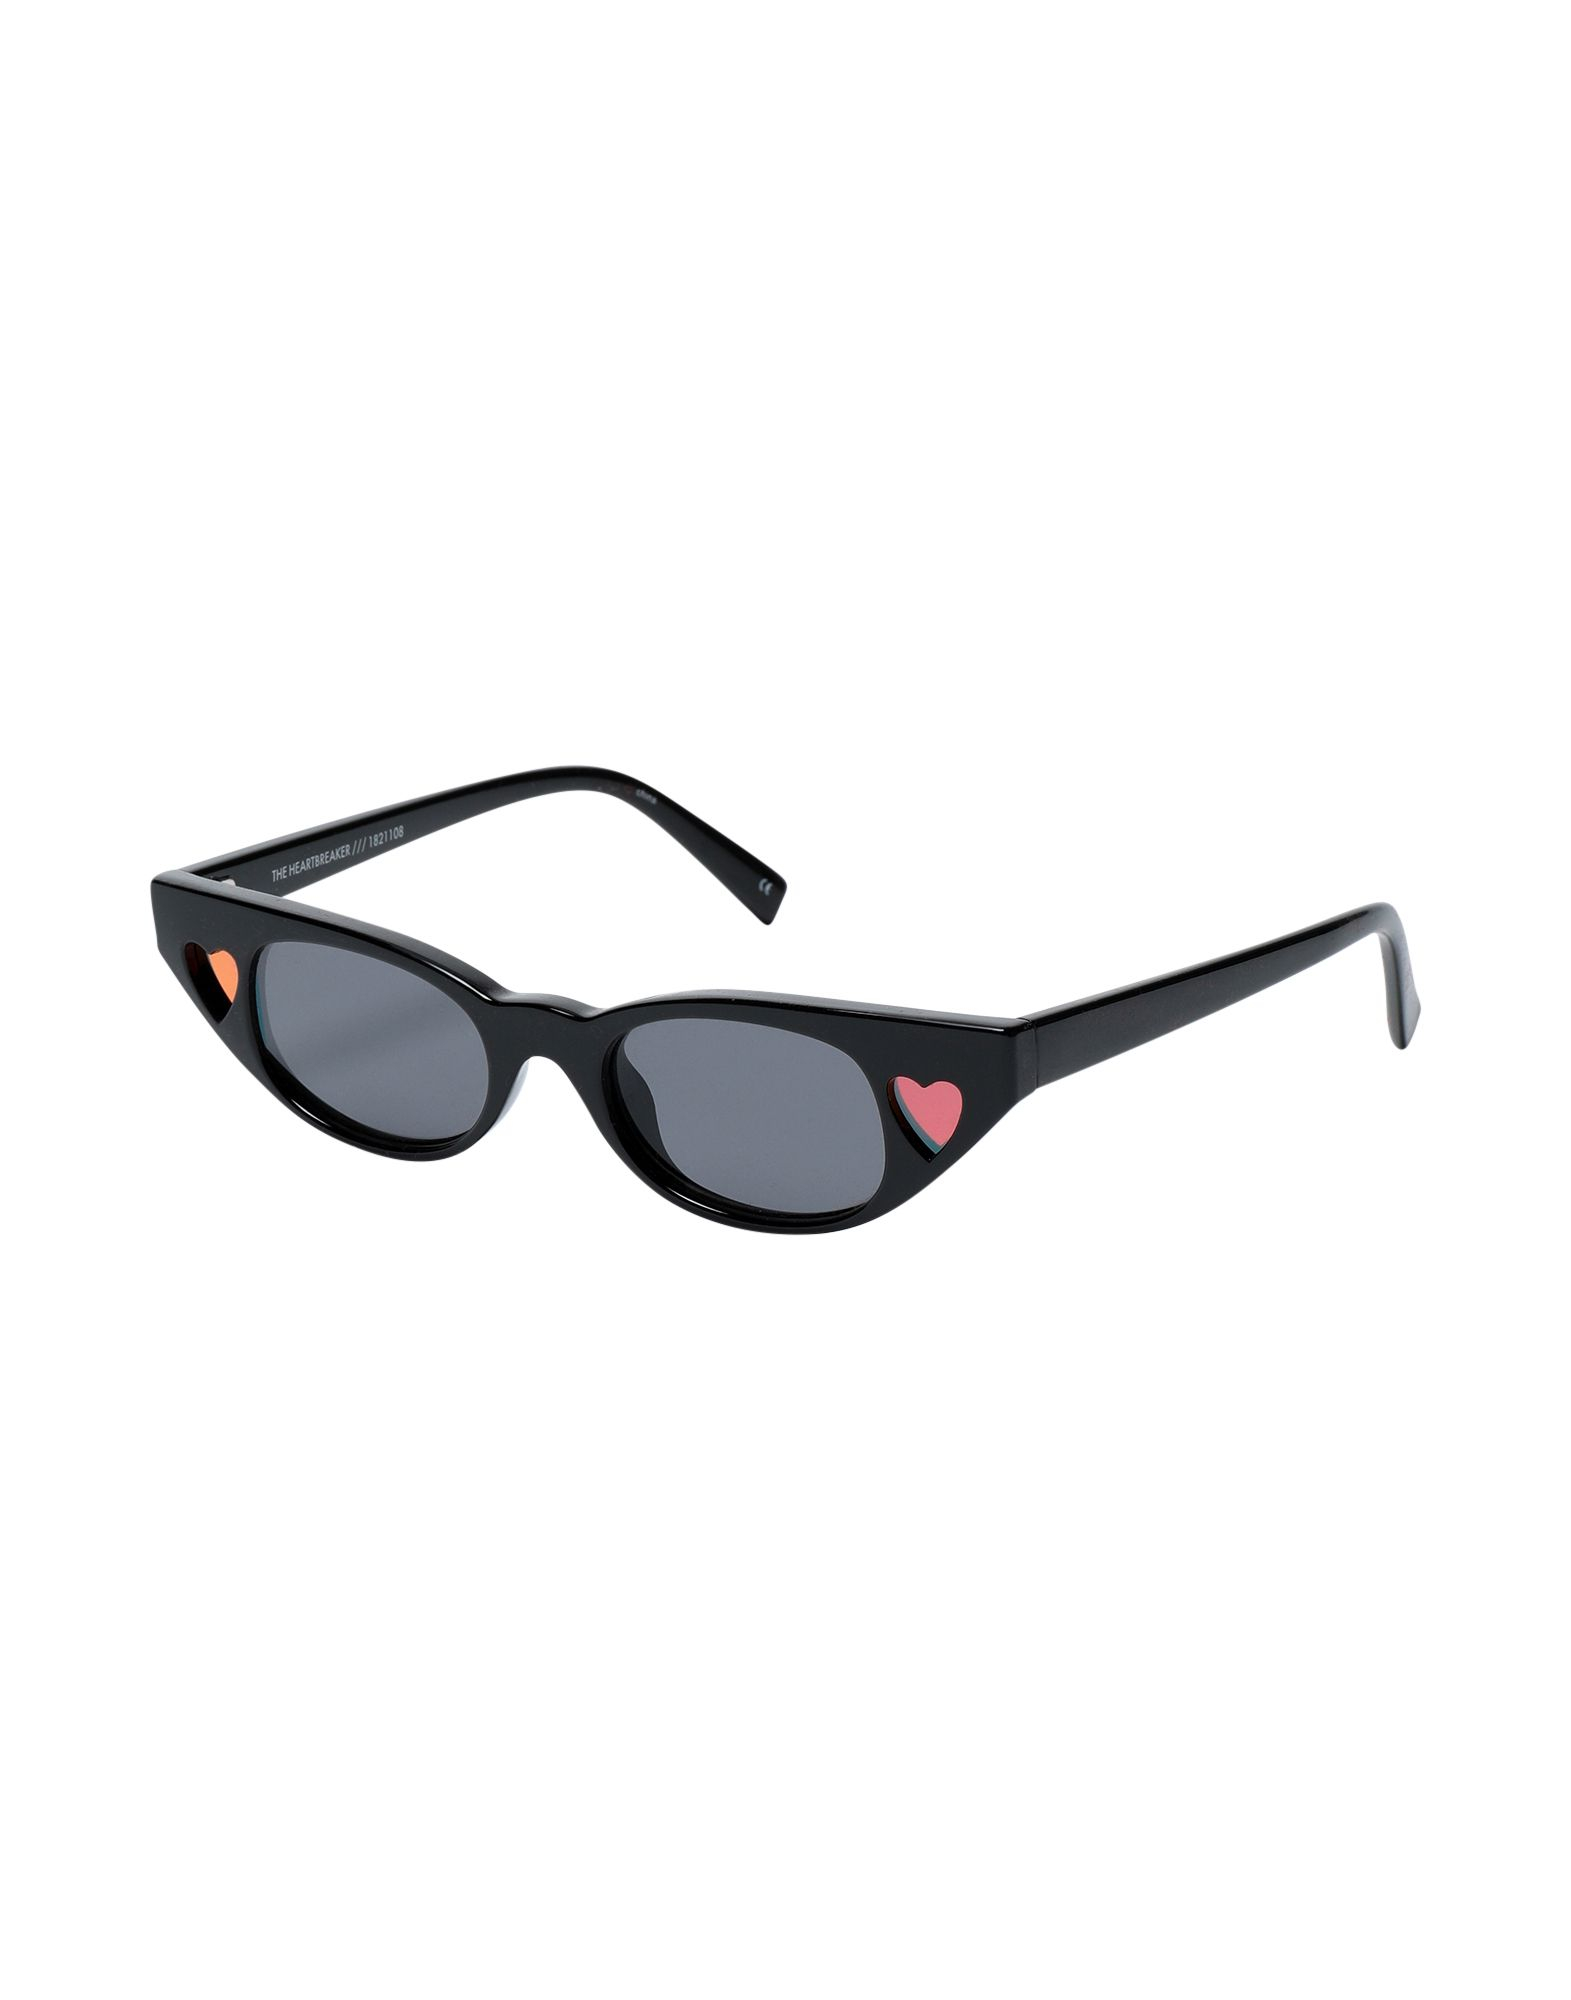 ADAM SELMAN x LE SPECS Солнечные очки adam selman x le specs солнечные очки